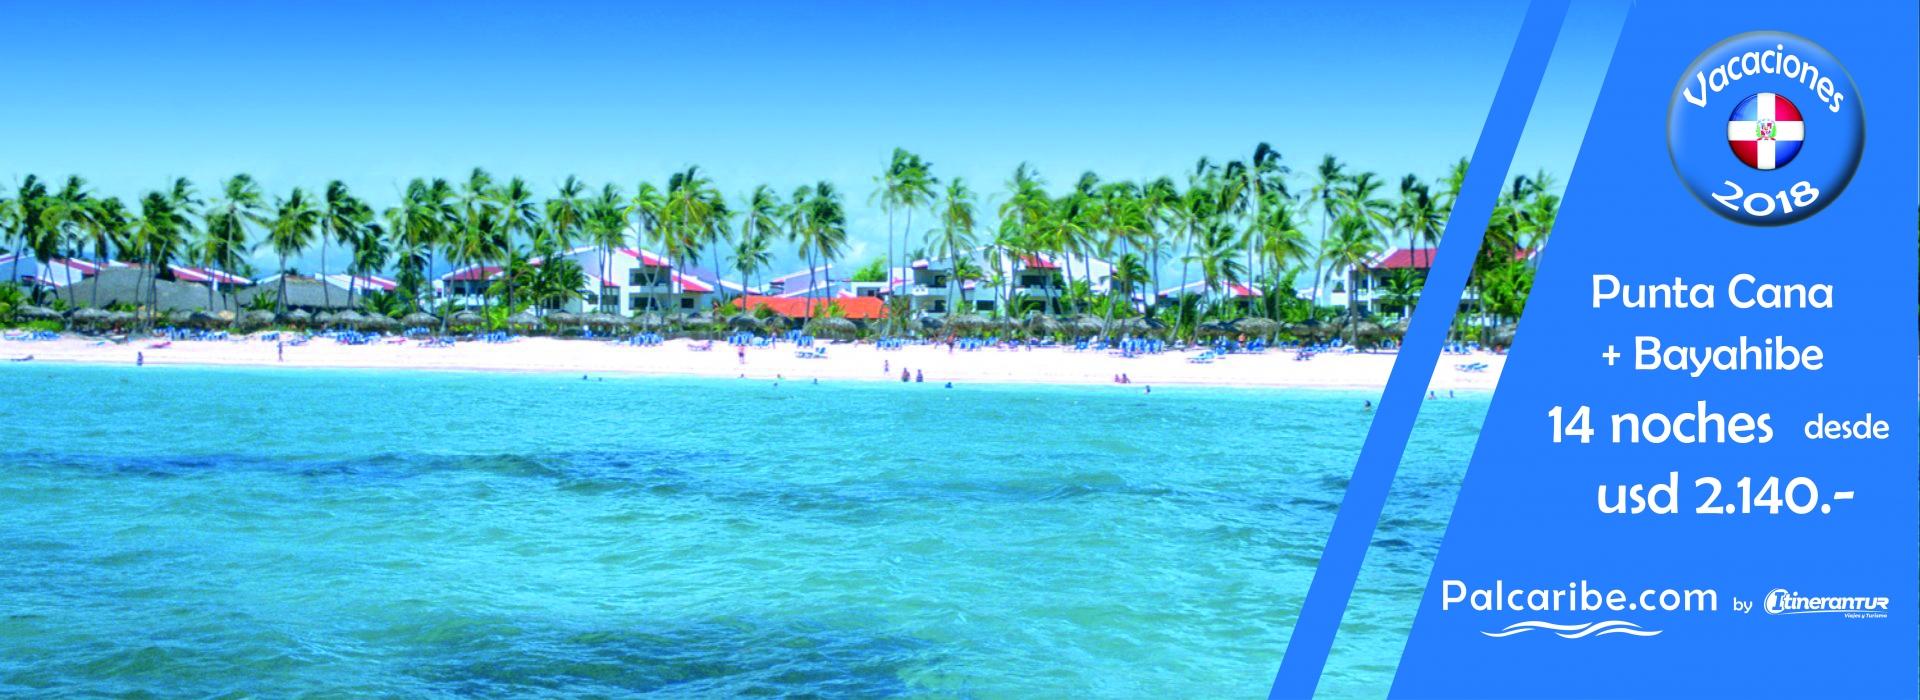 Punta Cana y Bayahibe